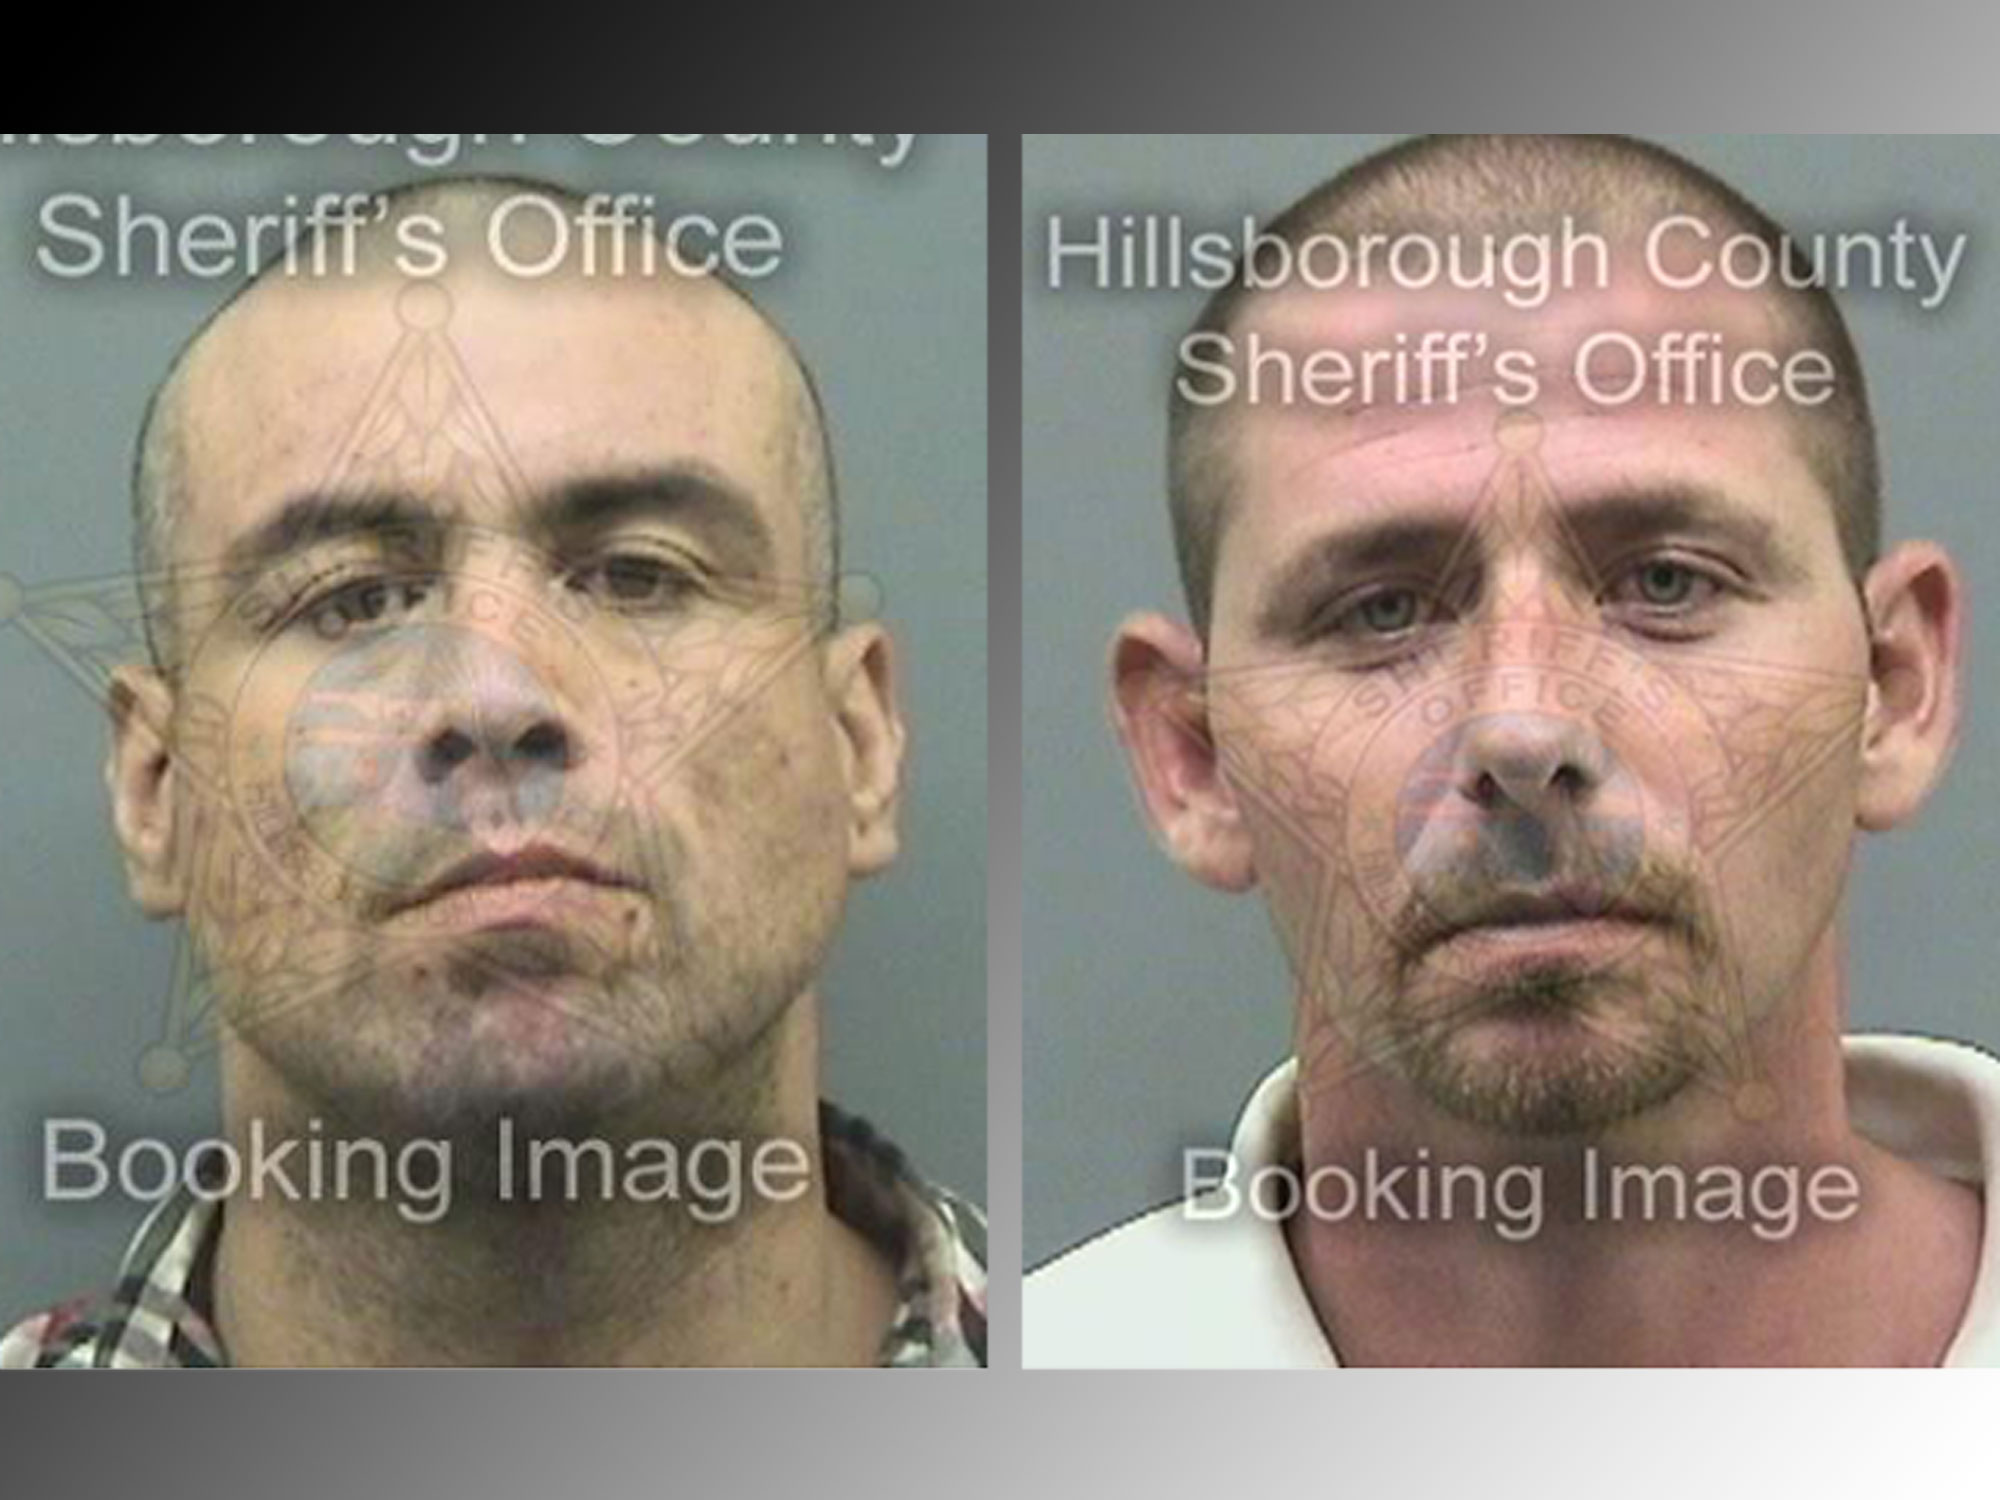 Automated Teller Machine Robbery: Robert Suggs and David